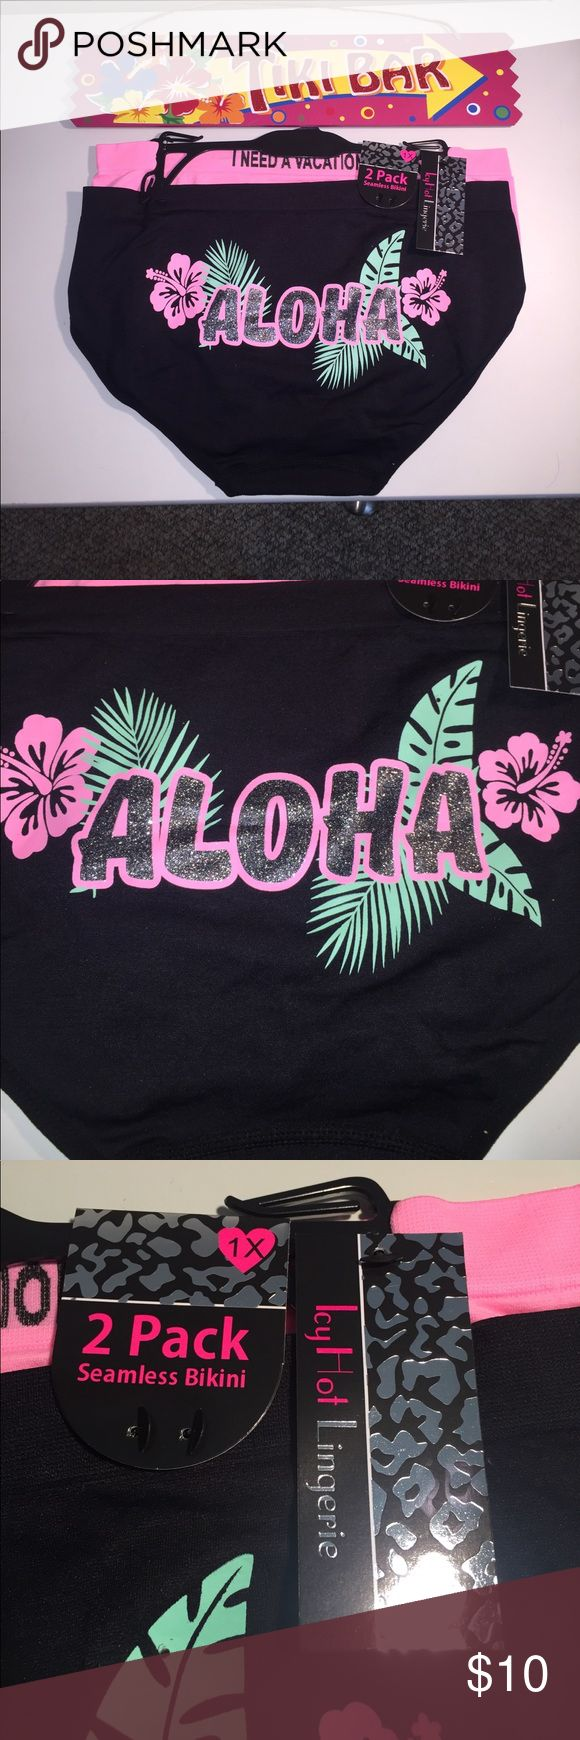 NEW 1X Super Cute Aloha Seamless Bikini 2 Pack NEW 1X Super Cute Aloha & I Need A Vacation 🌴Seamless Bikini Underwear 2 Pack Icy Hot Lingerie 💋 Intimates & Sleepwear Panties